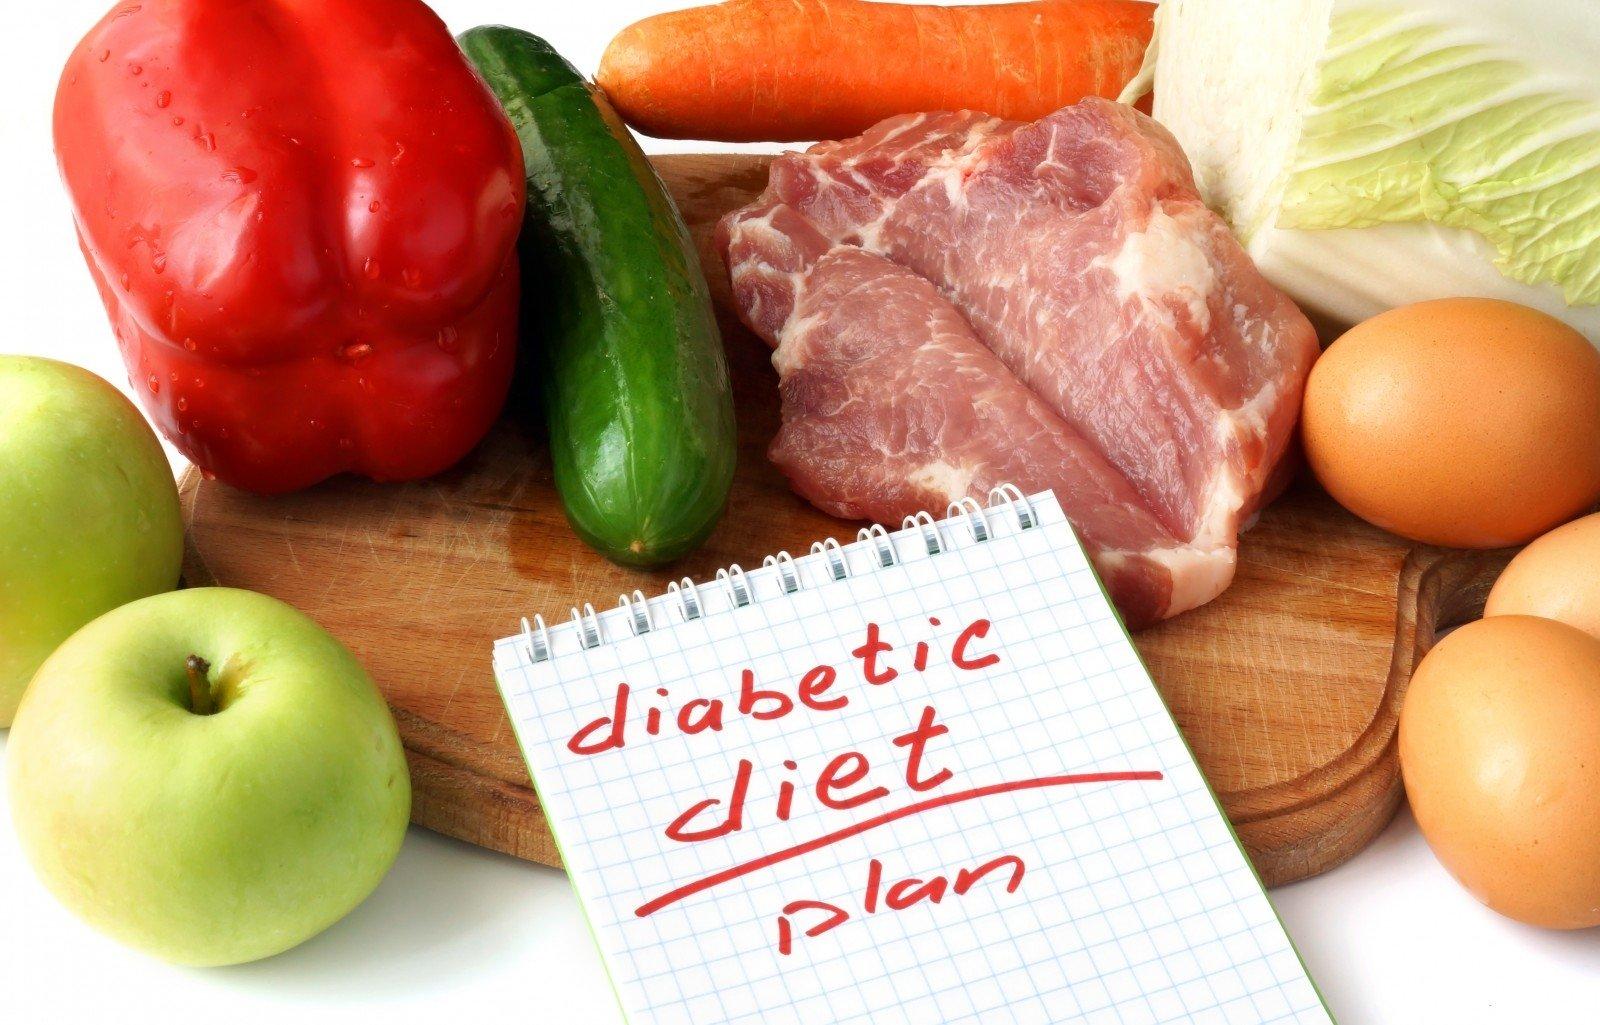 ką galite gerti ir valgyti sergant hipertenzija hipertenzija kaip psichosomatika